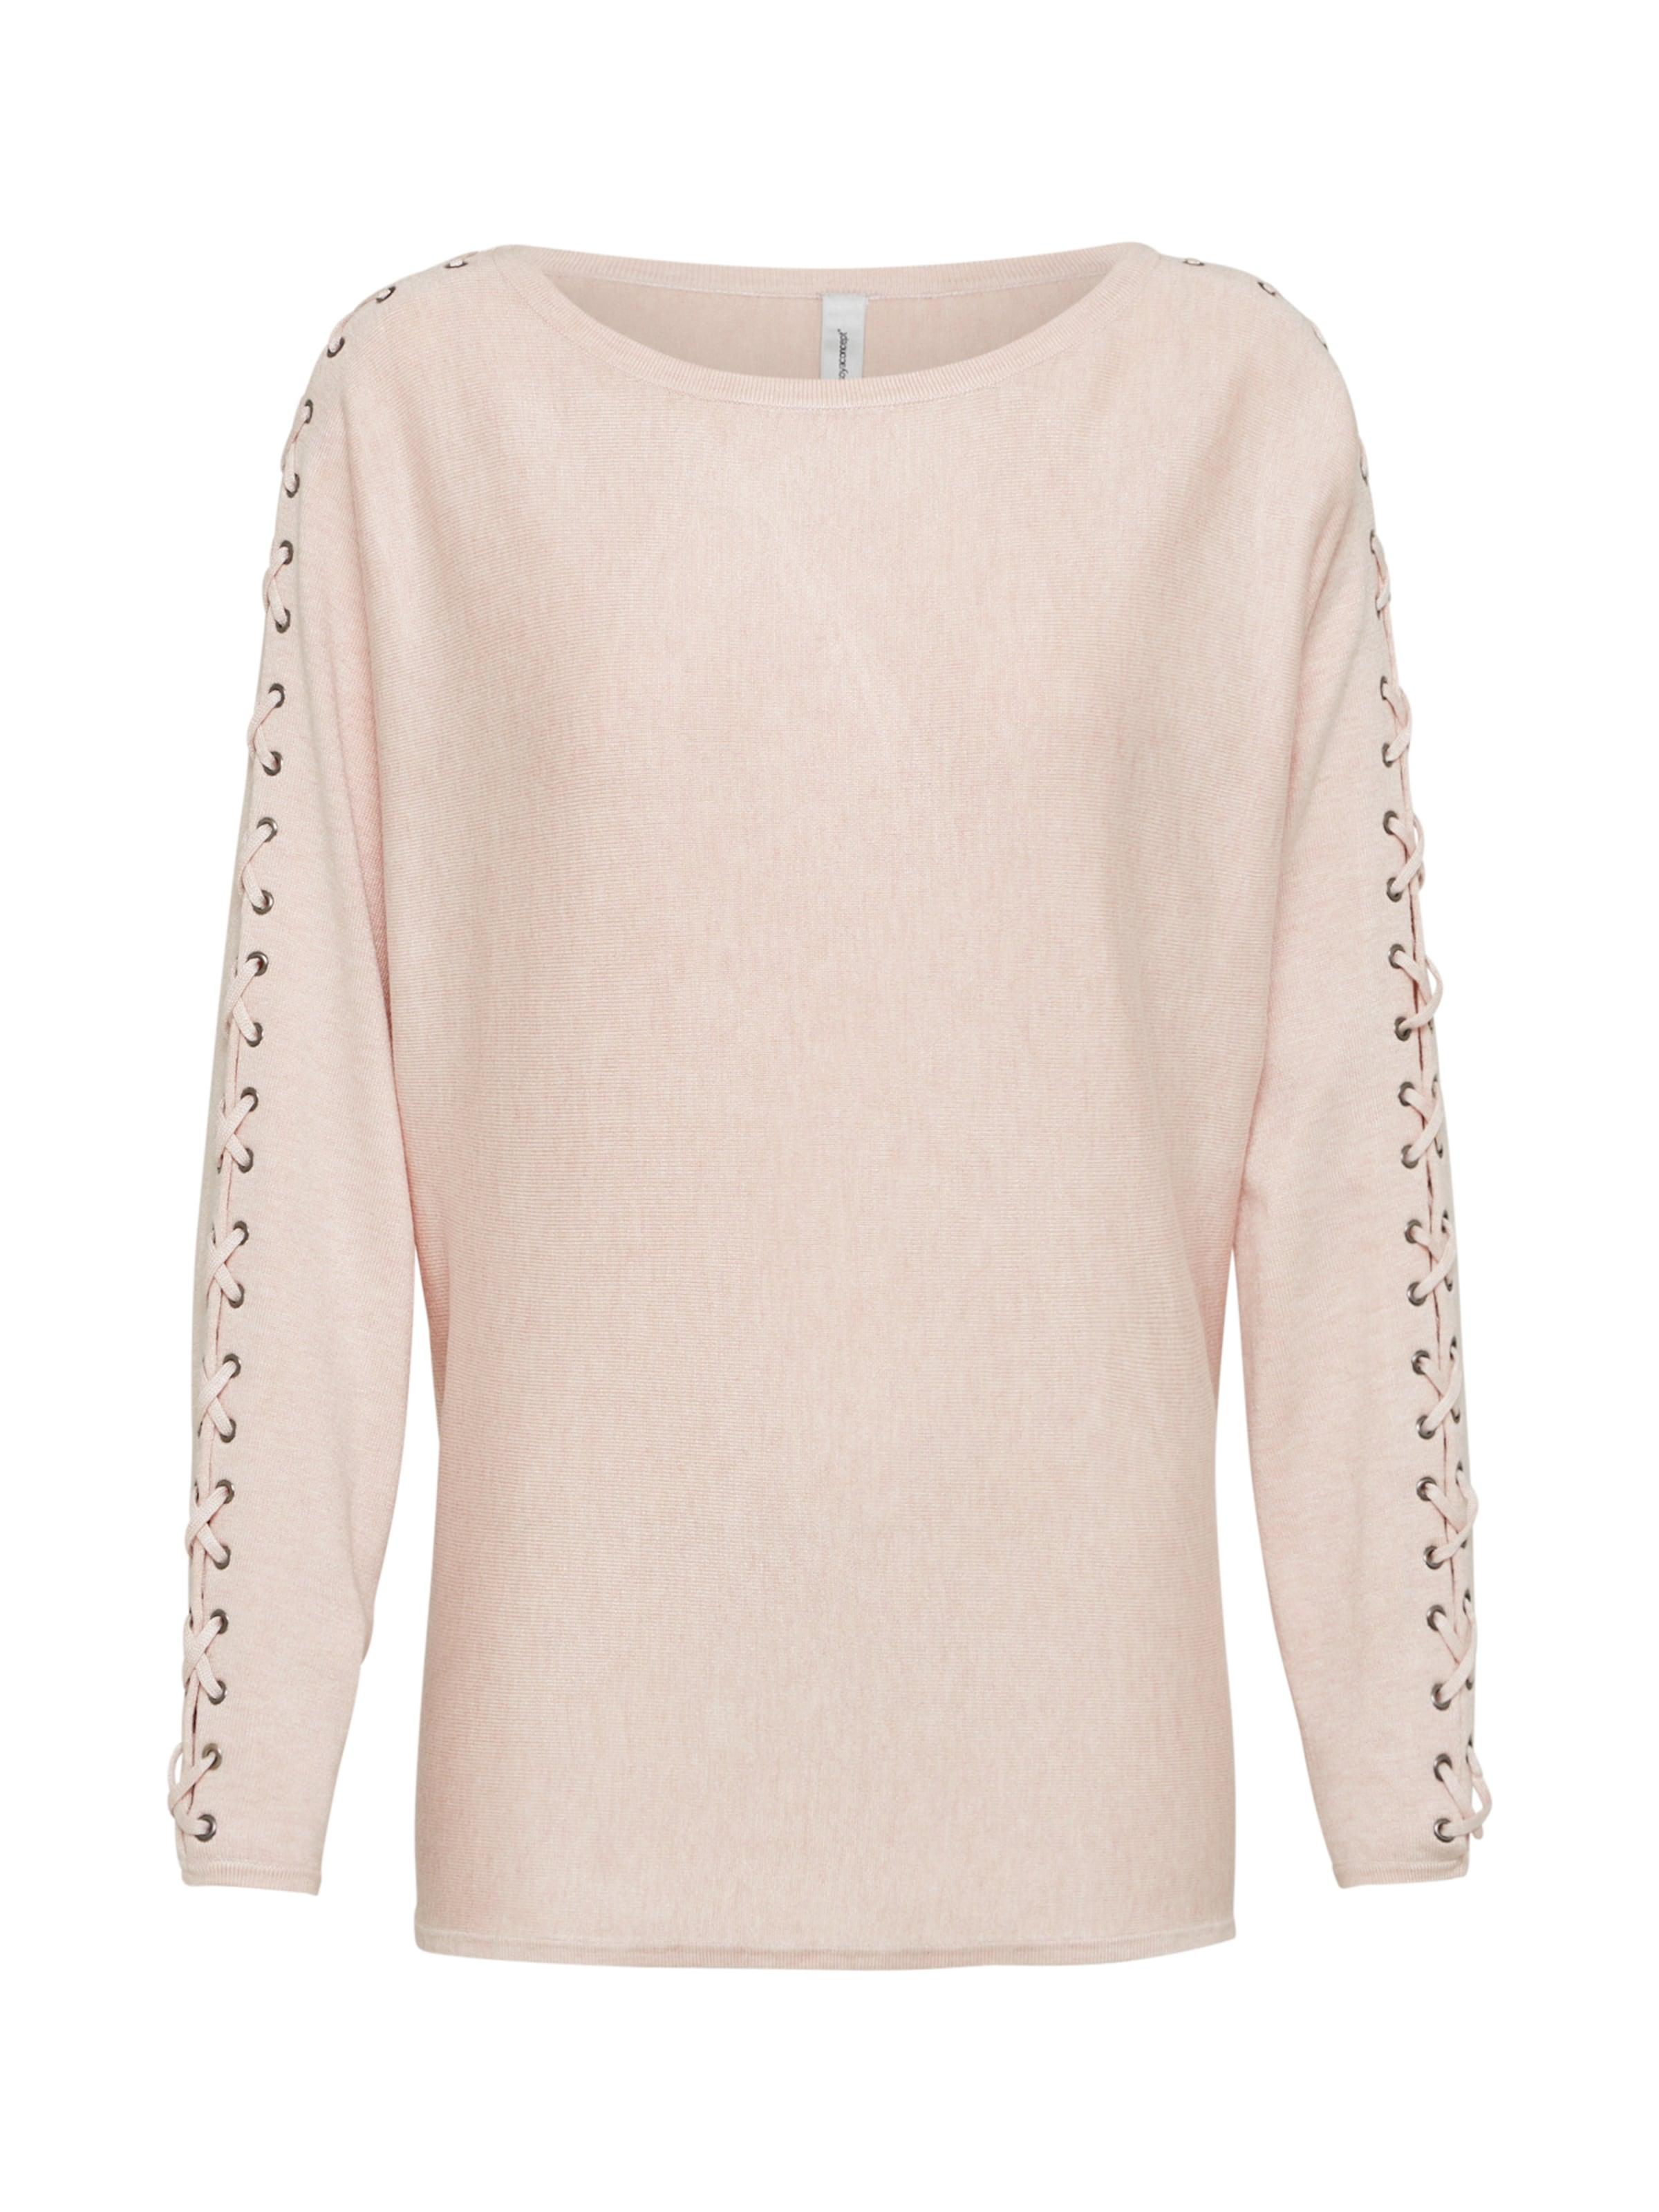 Shirt SC-LALIN 1 rosa / weiß Soyaconcept rNWXiiWhz